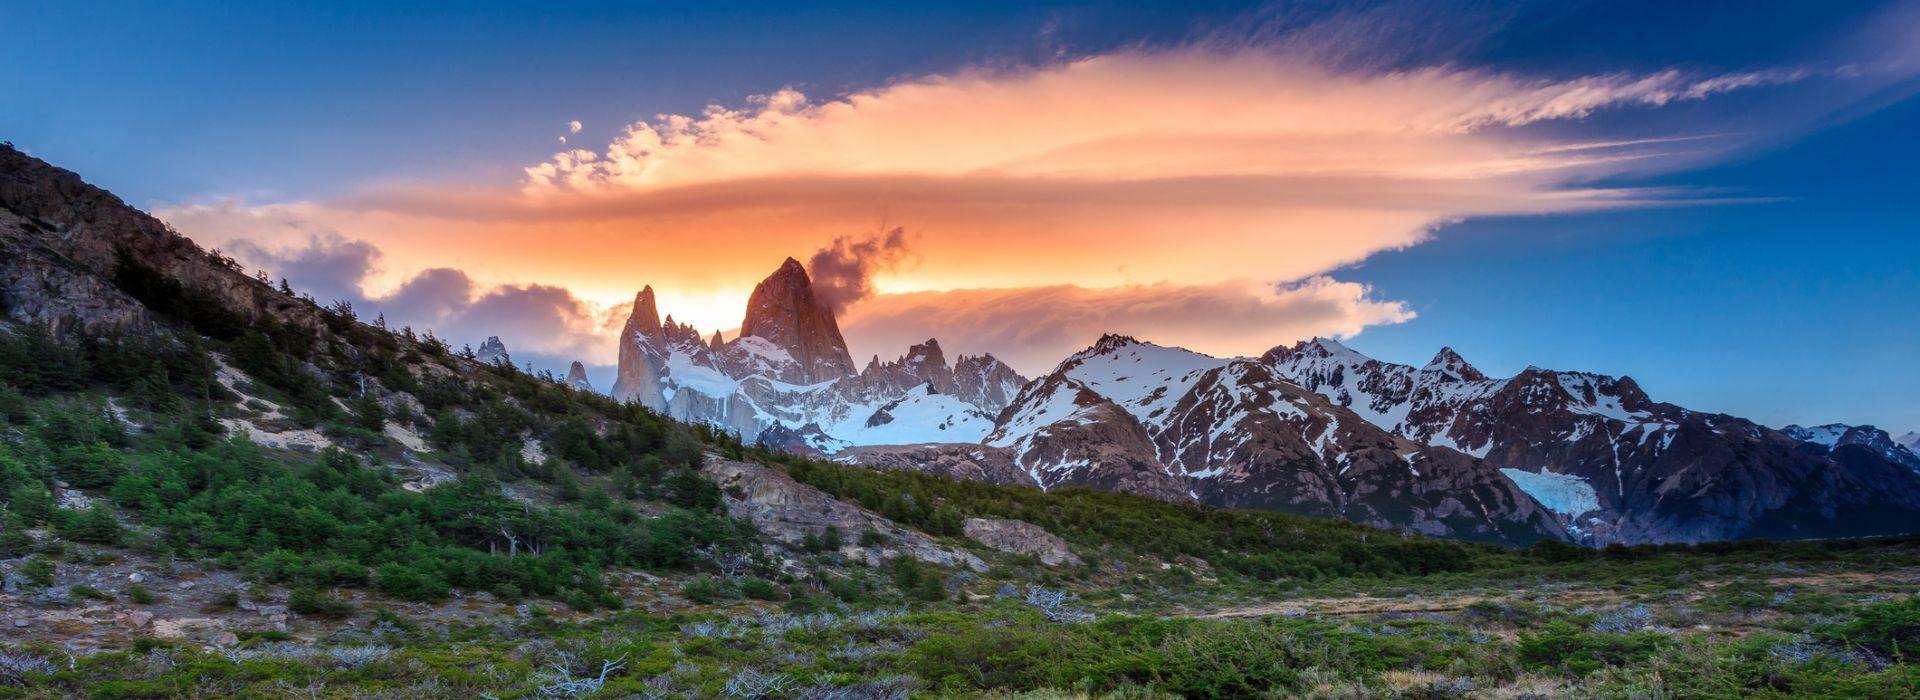 Wildlife Tours in Argentina